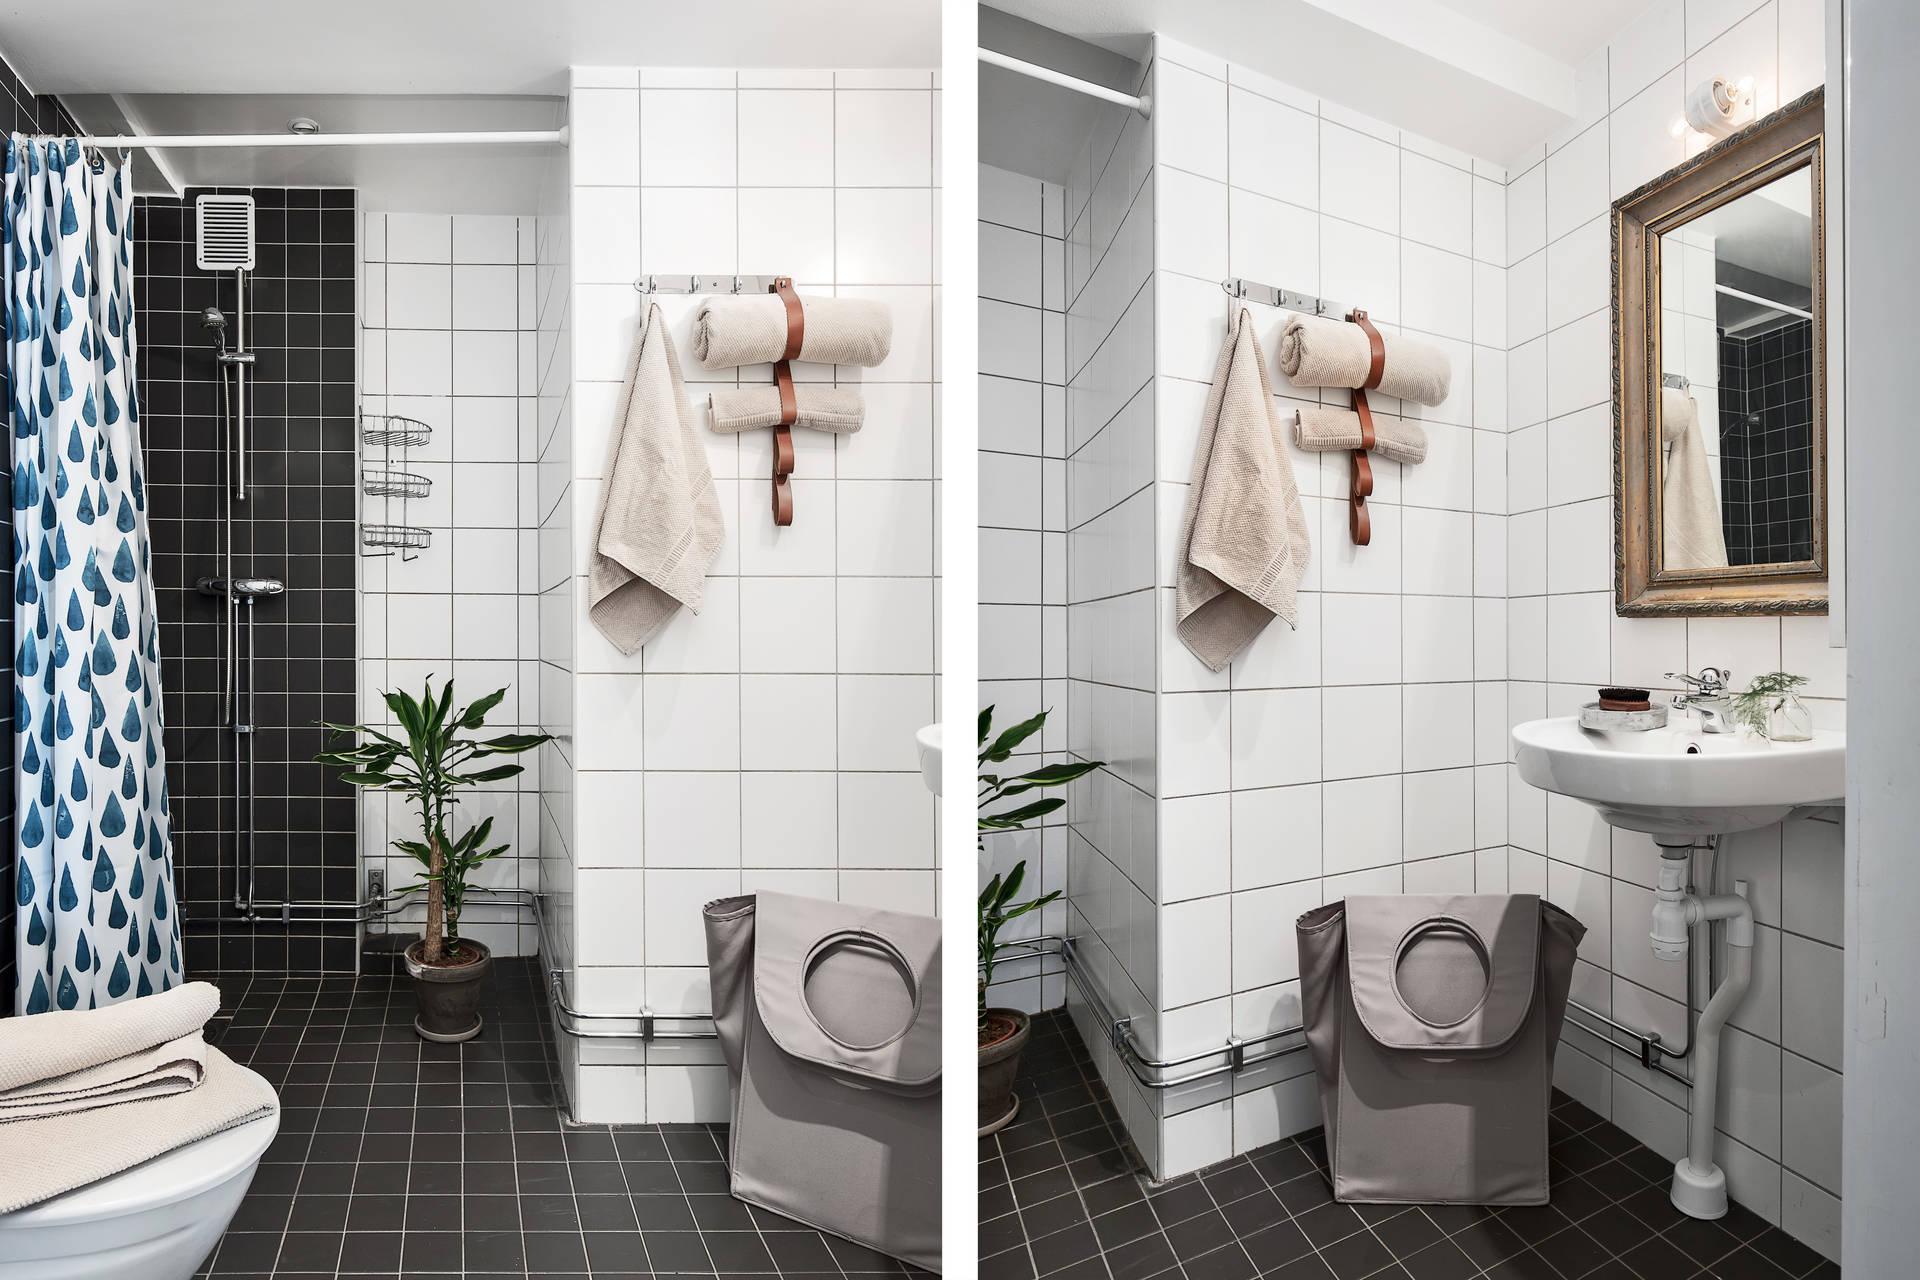 санузел душ раковина зеркало смеситель